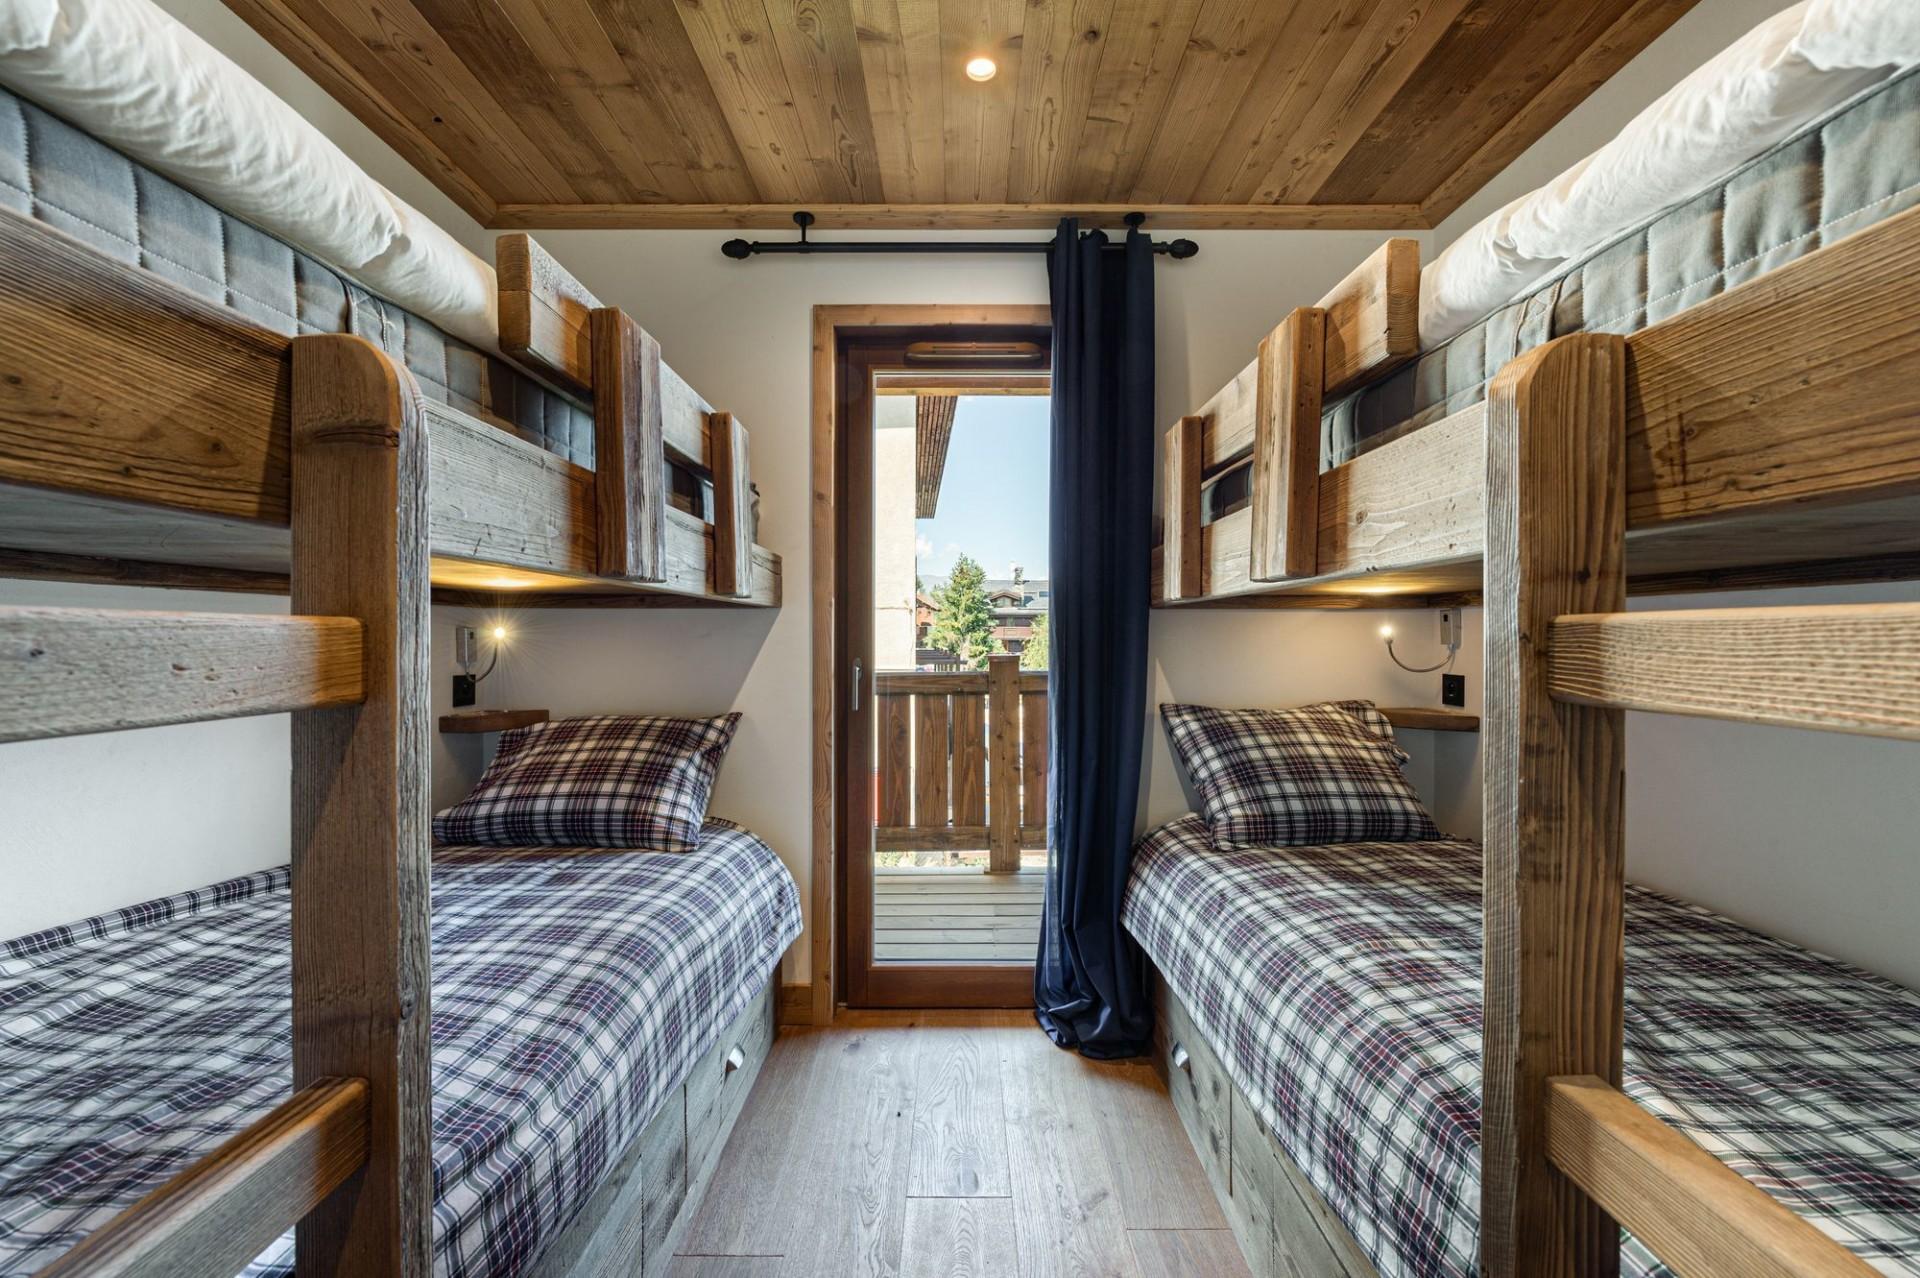 Courchevel 1300 Luxury Rental Appartment Tilite Bedroom